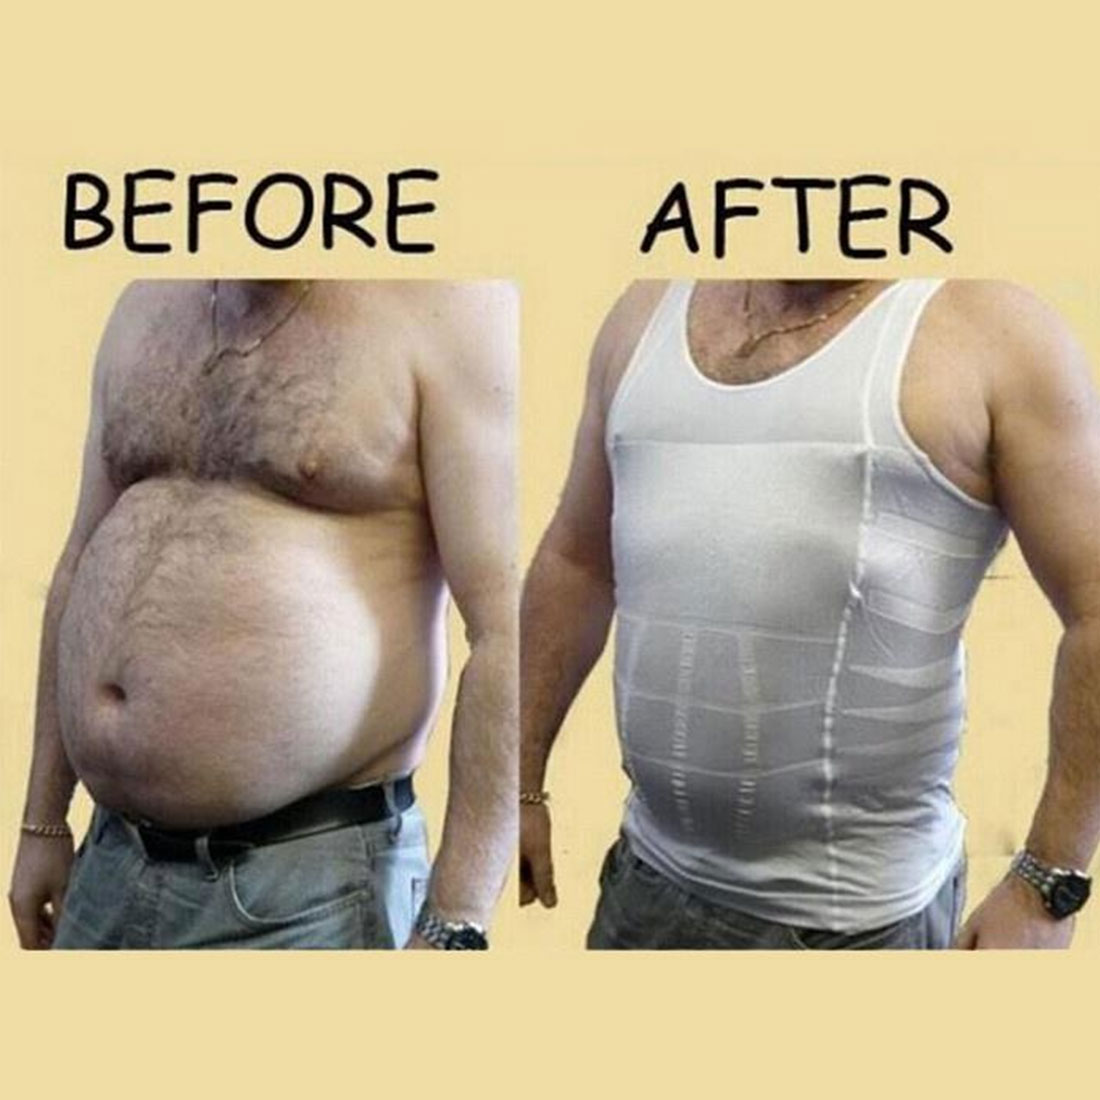 sous vetement hommes Slim lift Men 39 s body sculpting slimming vest Waist and abdomen underwear less beer belly Thin chest waist v in Shapers from Underwear amp Sleepwears